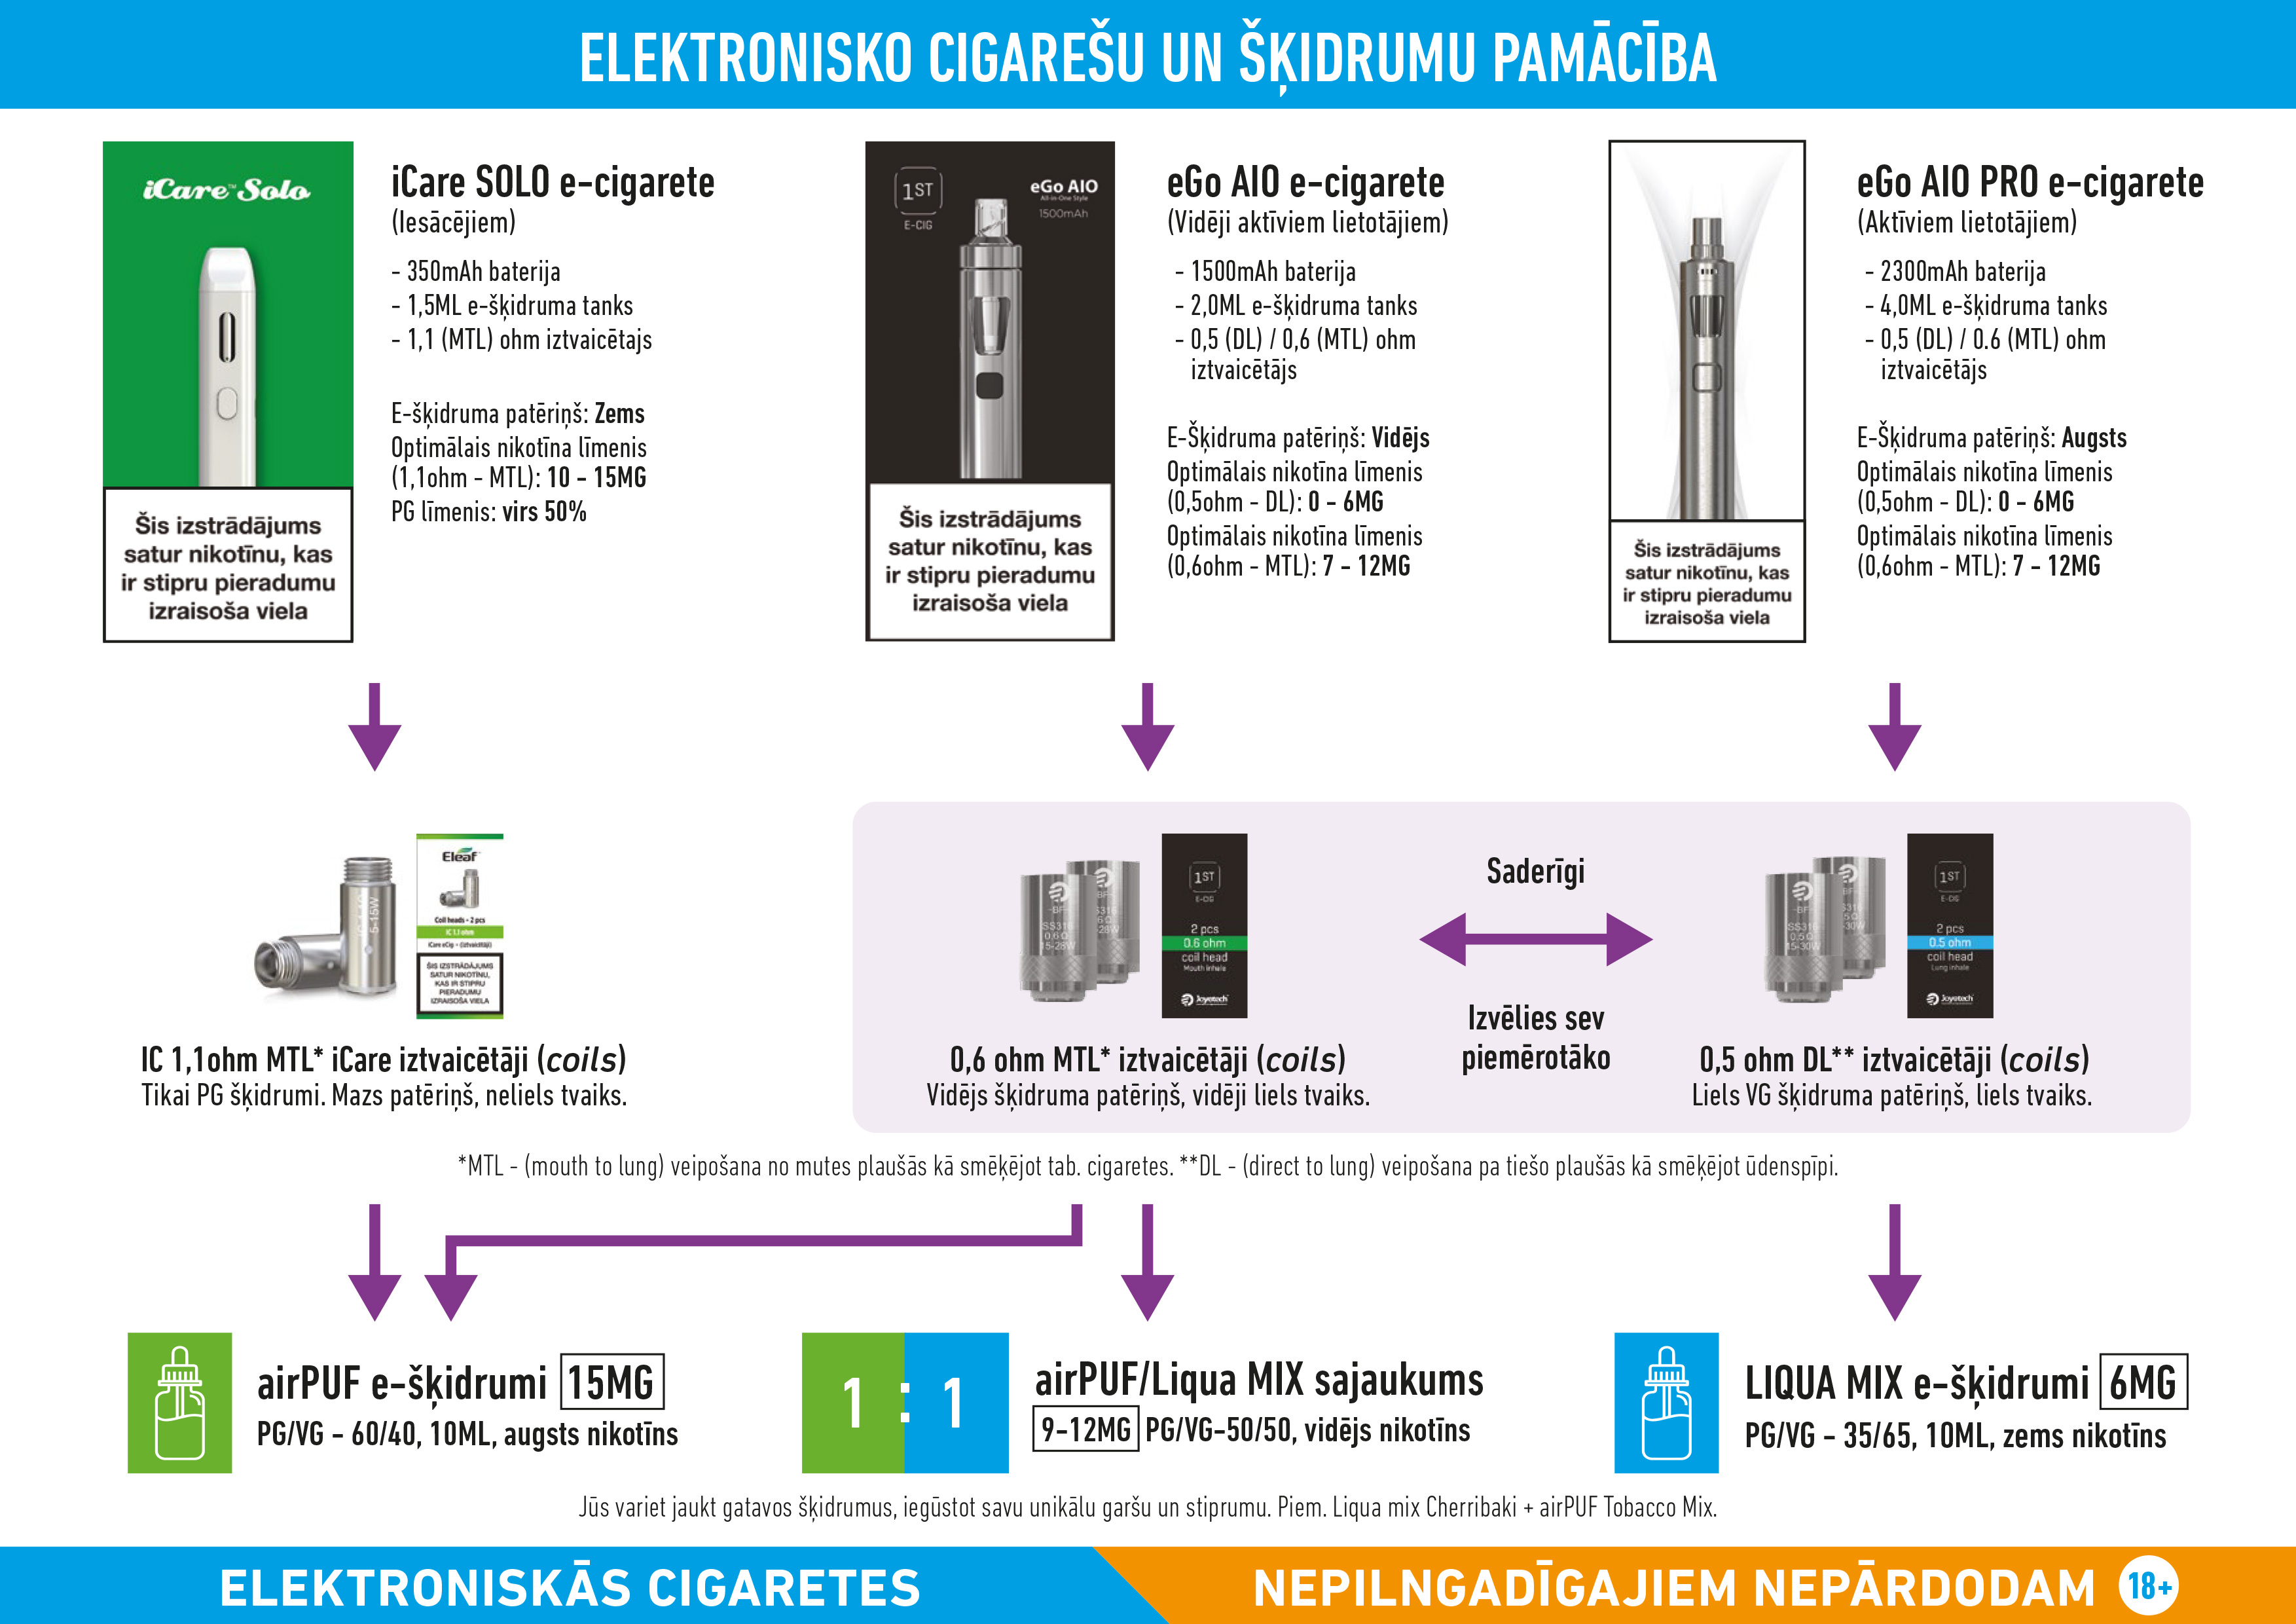 elektroniskās cigaretes narvesen, e-cigaretes neste dus veikalos, ecig, airpuf